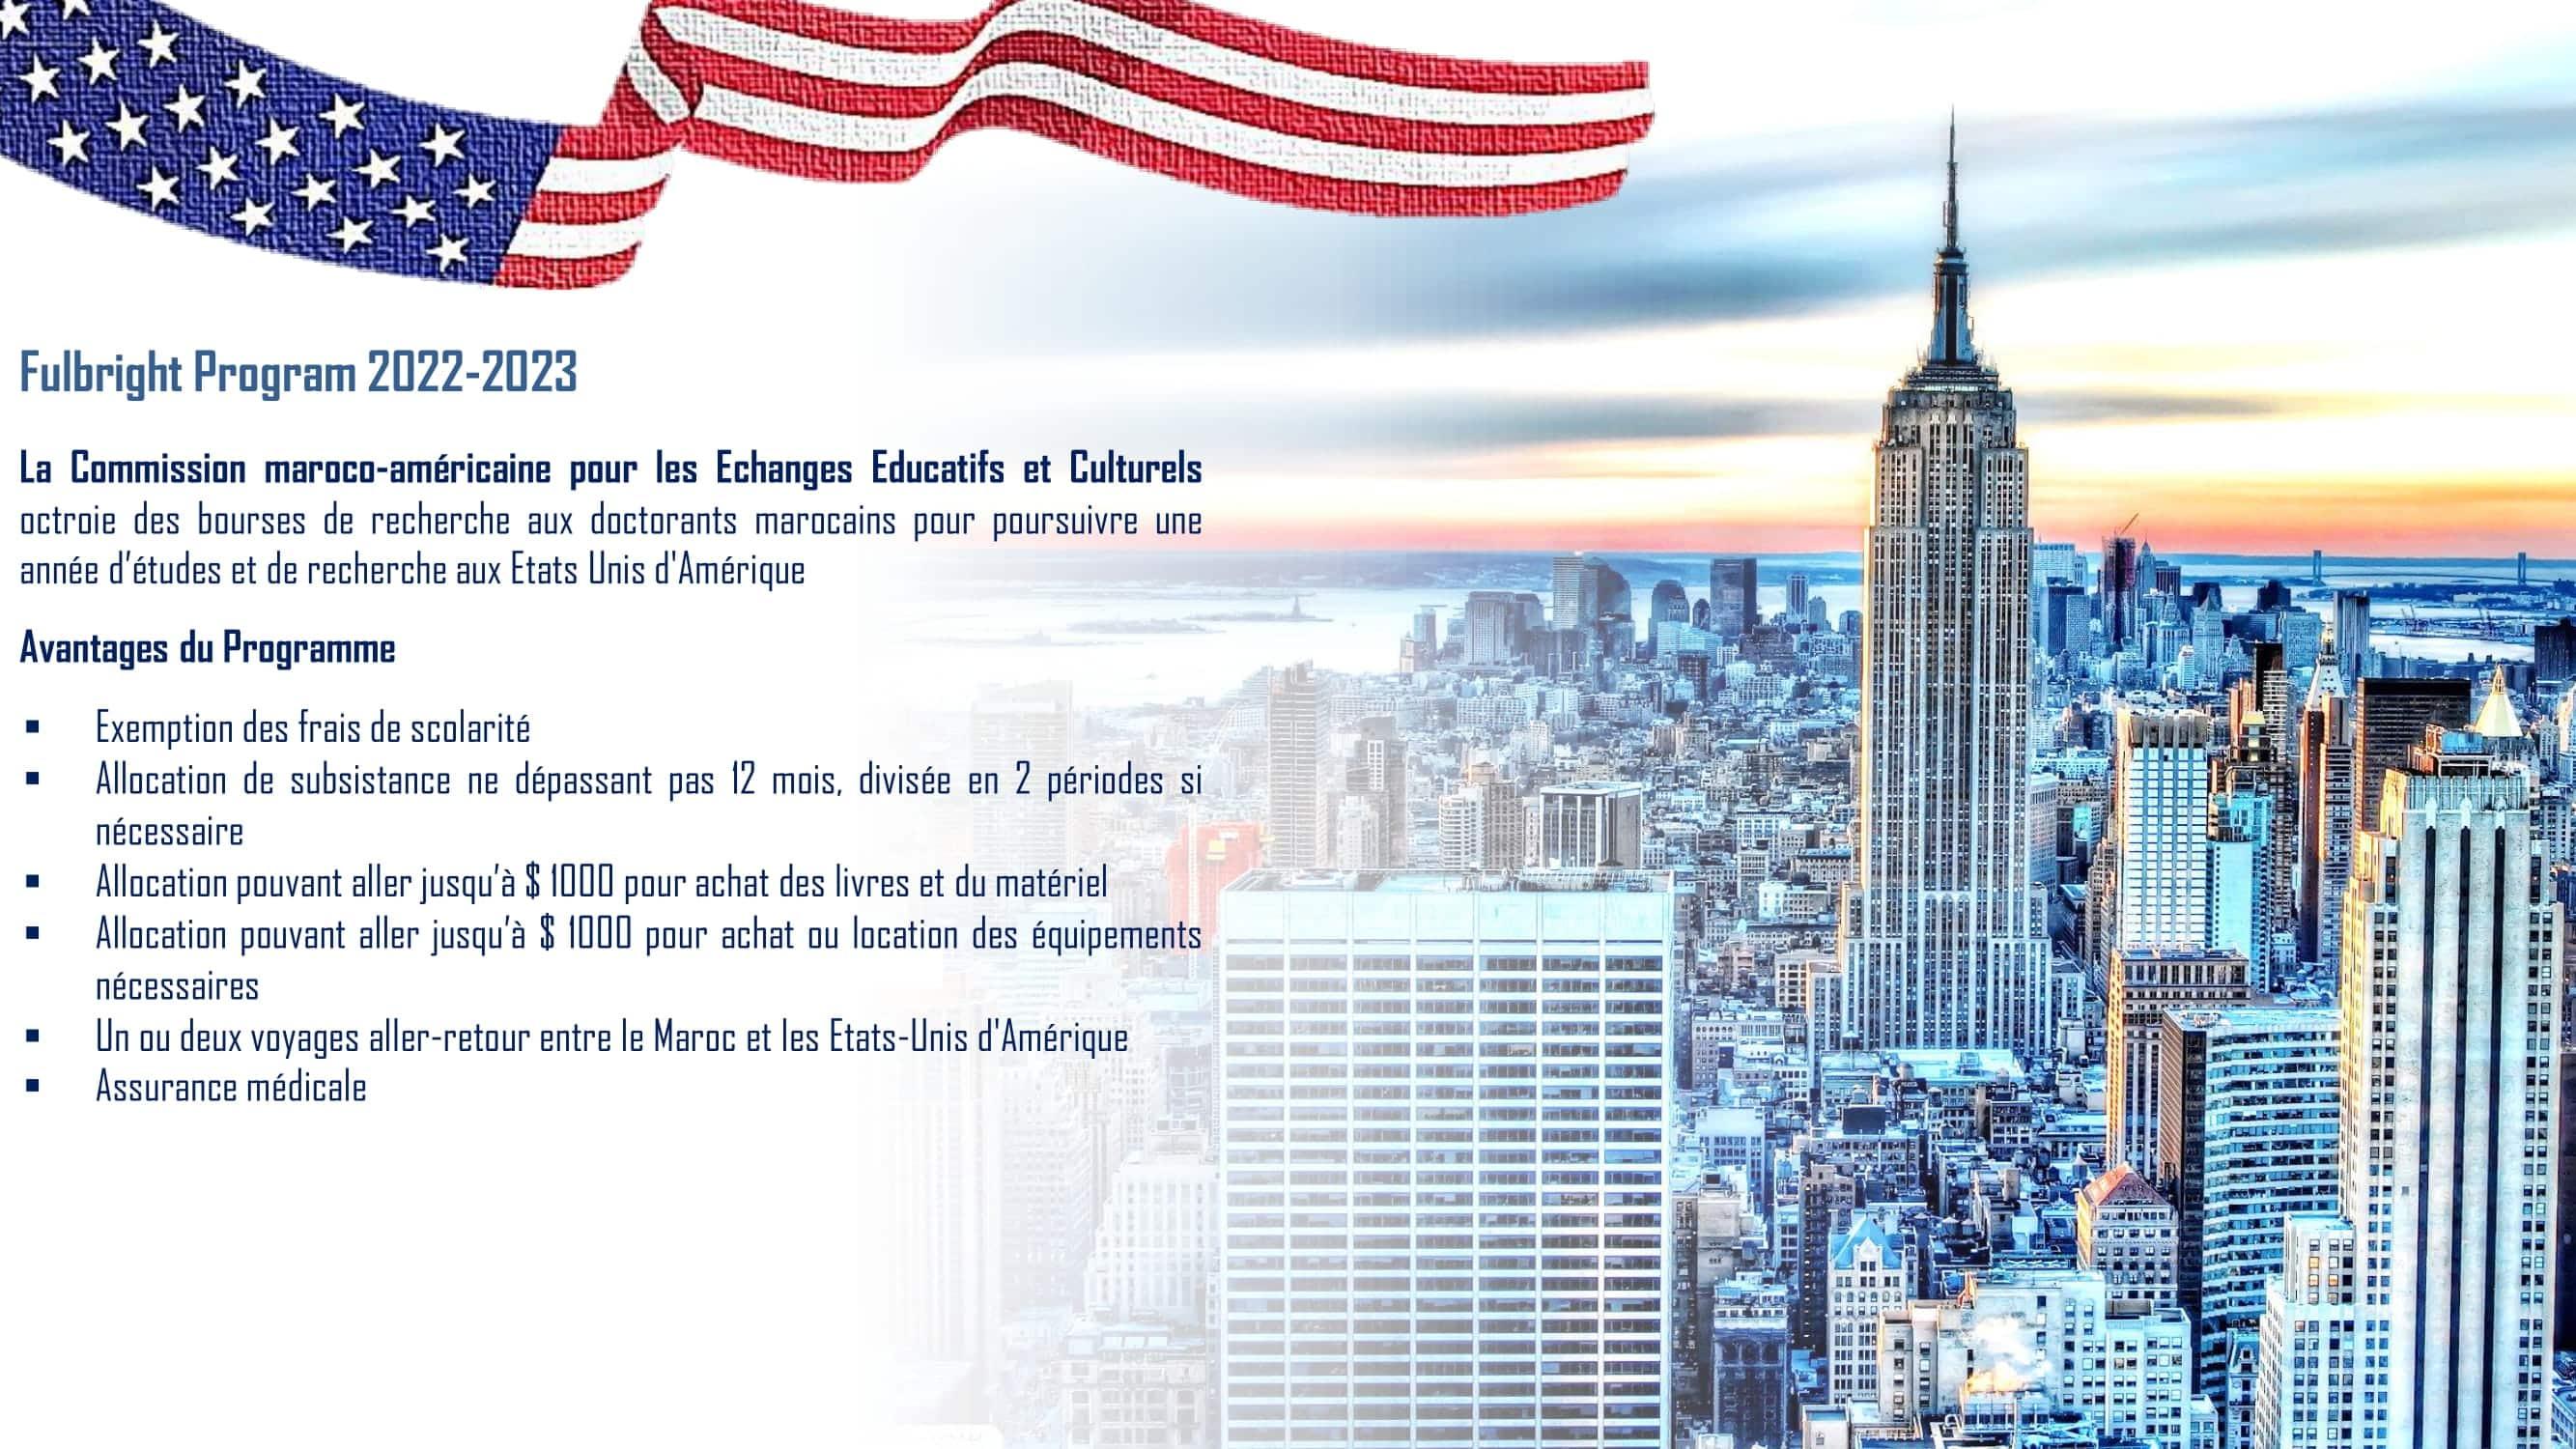 Doctorat Fulbright 1 Bourses Fullbright Program aux Etats-Unis 2022/2023